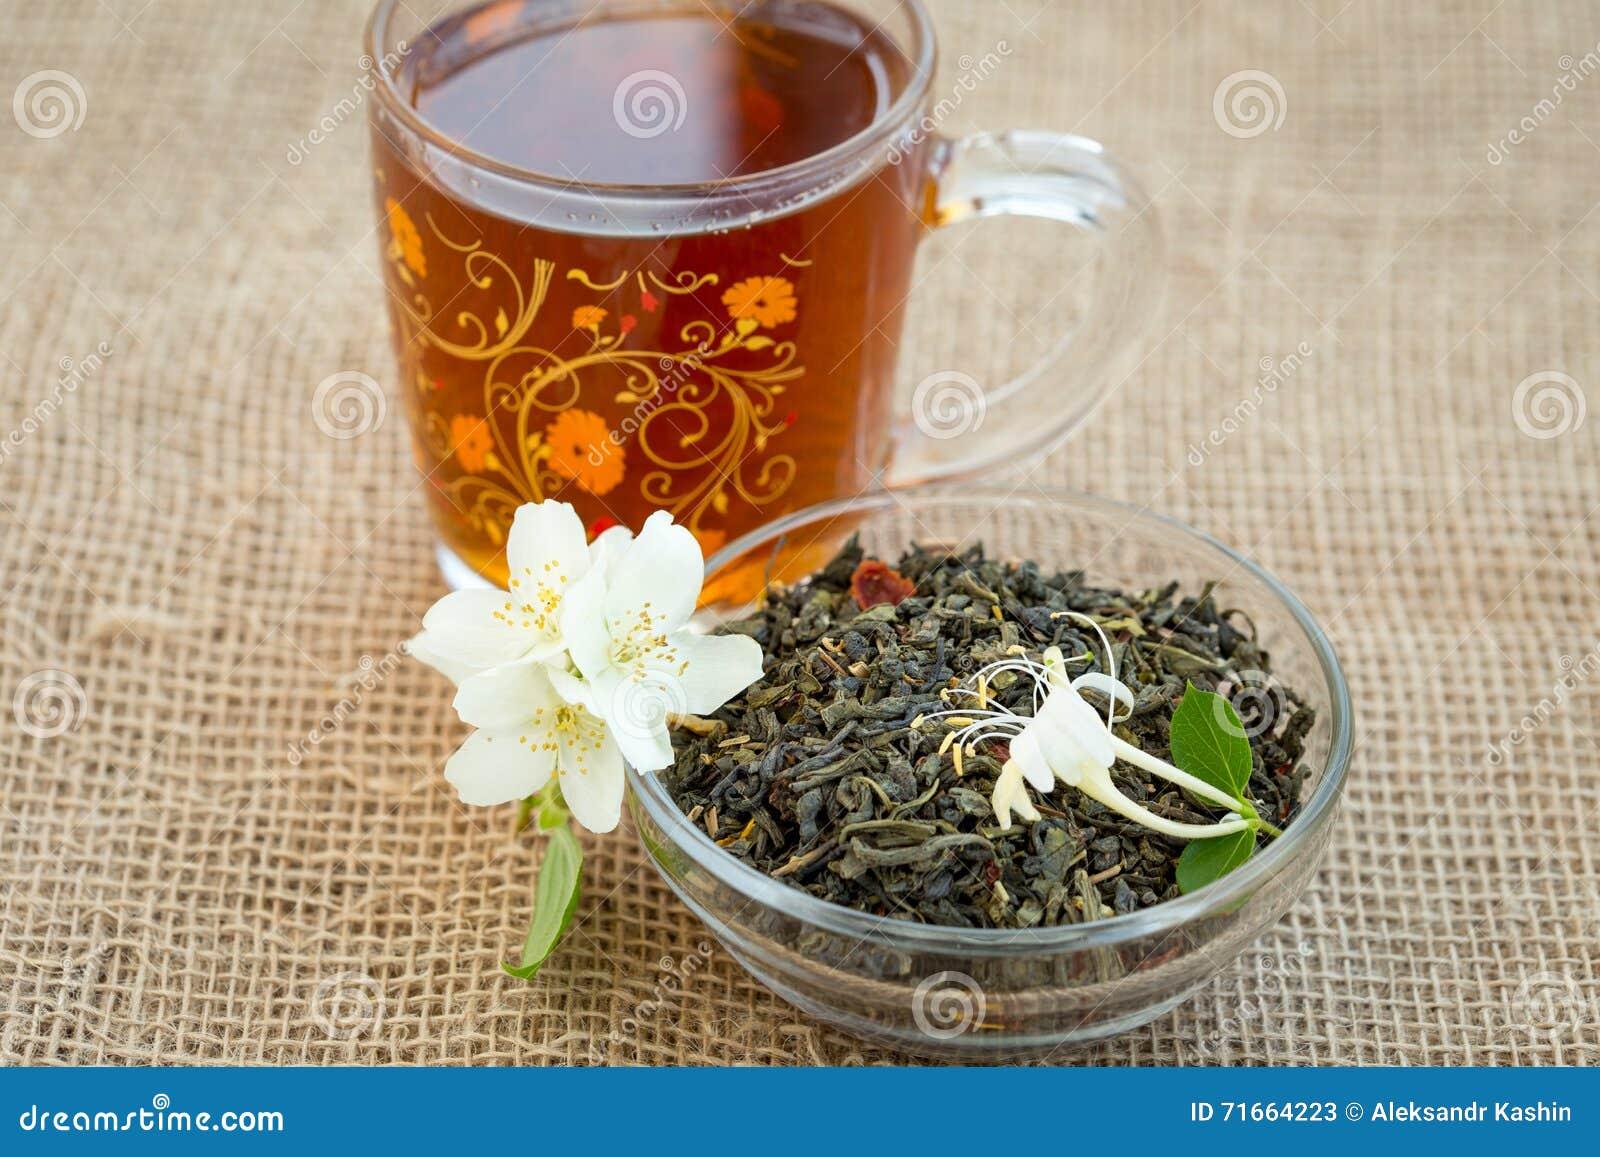 Mug Of Tea And Dried Green Tea With Jasmine Flowers Stock Image